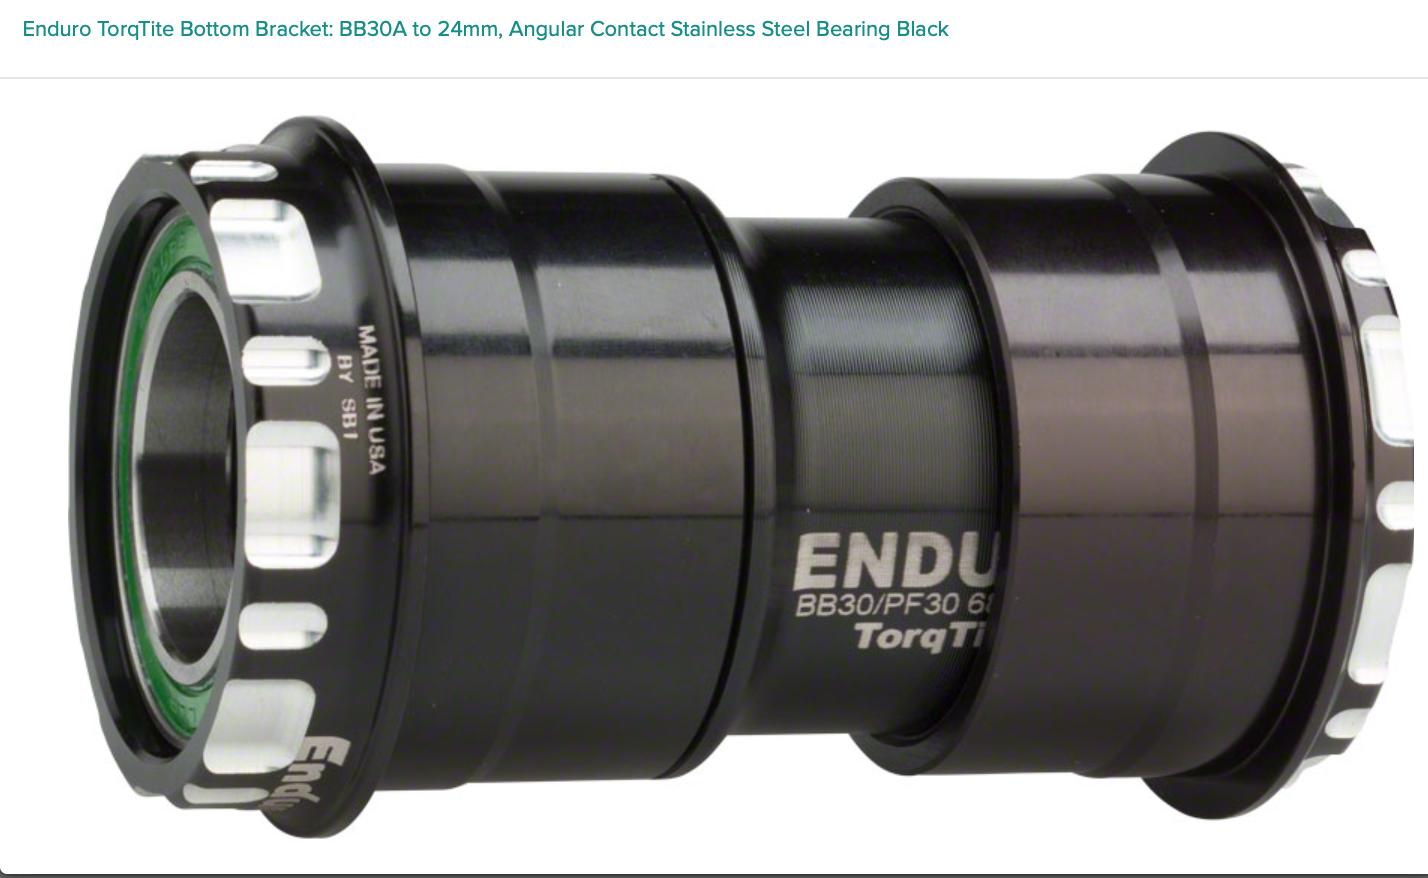 Enduro Enduro TorqTite Bottom Bracket: BB30A to 24mm, Angular Contact Stainless Steel Bearing Black